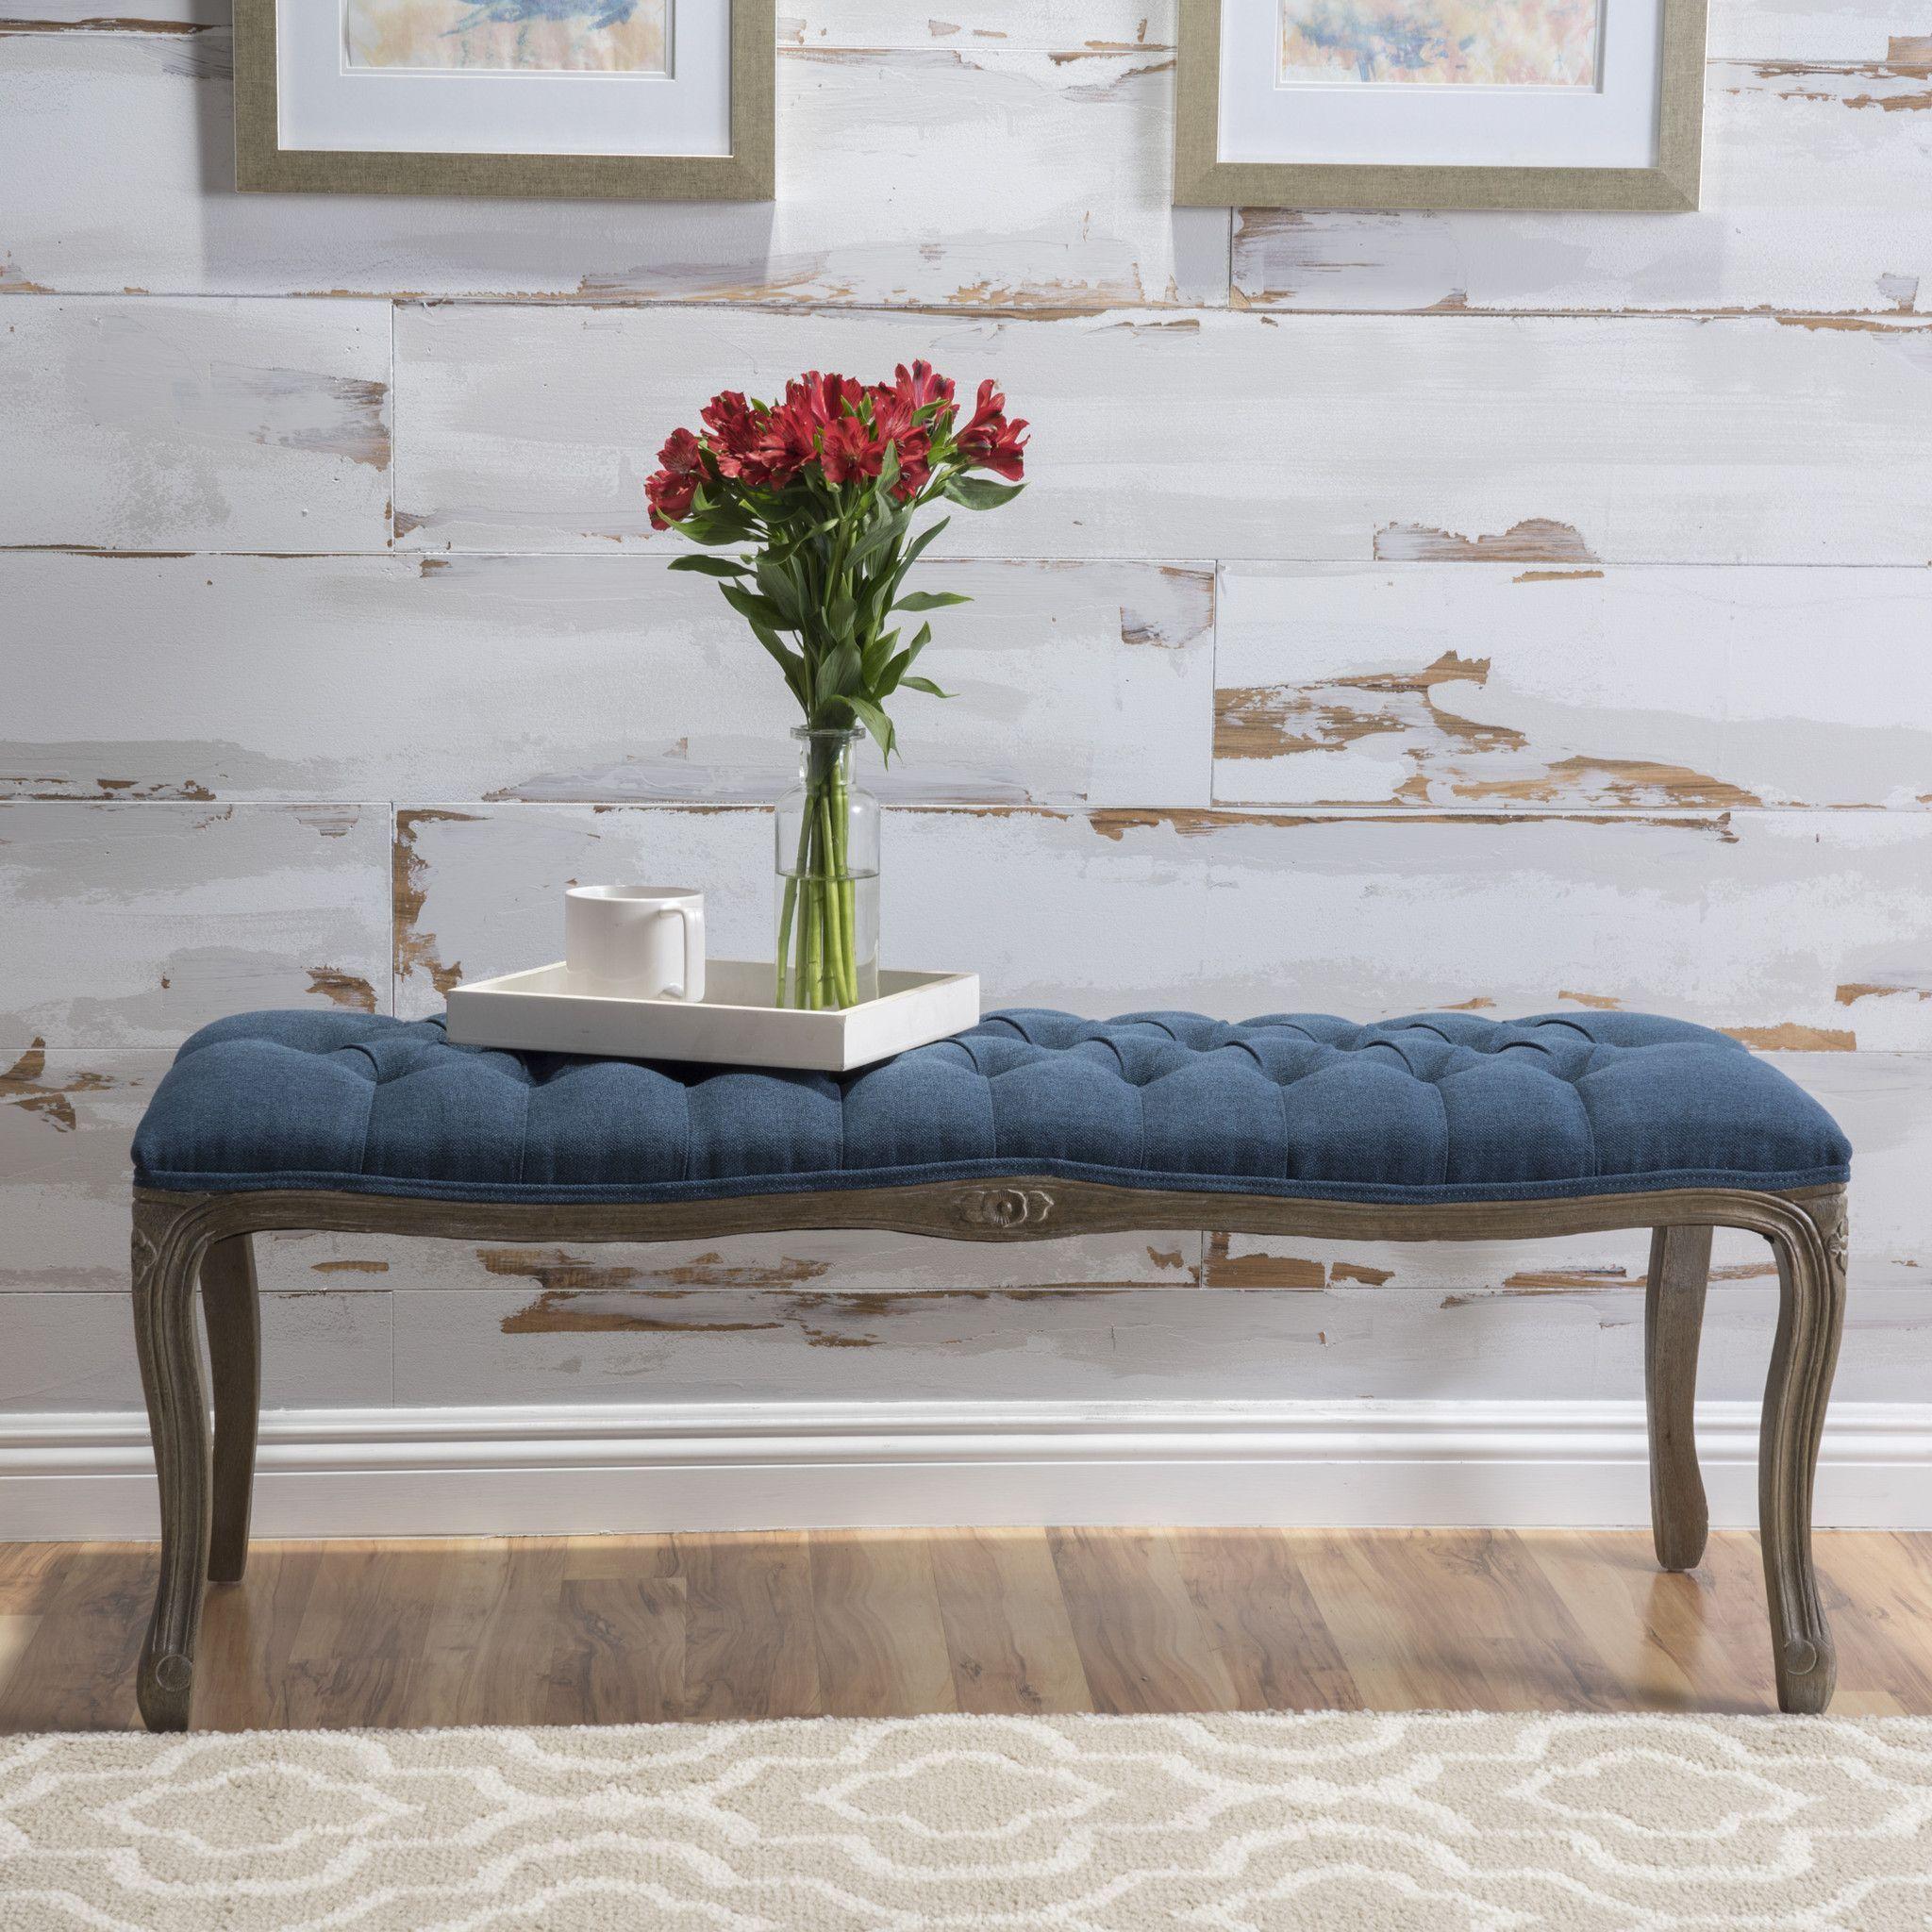 Tasette Tufted Royal Blue Fabric Bench